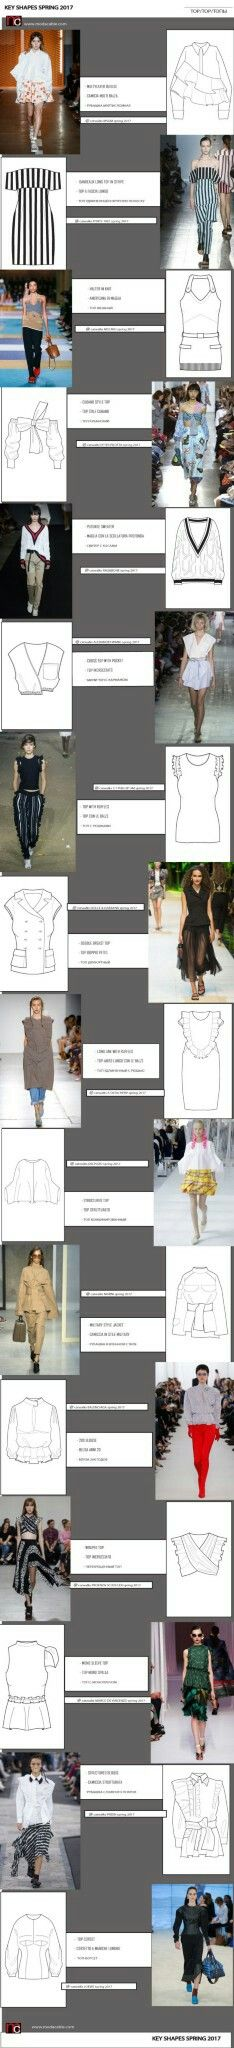 Flat Drawings, Flat Sketches, Technical Drawings, Design Basics, Web Design, Fashion Sketchbook, Fashion Sketches, Look 2017, Fashion Words